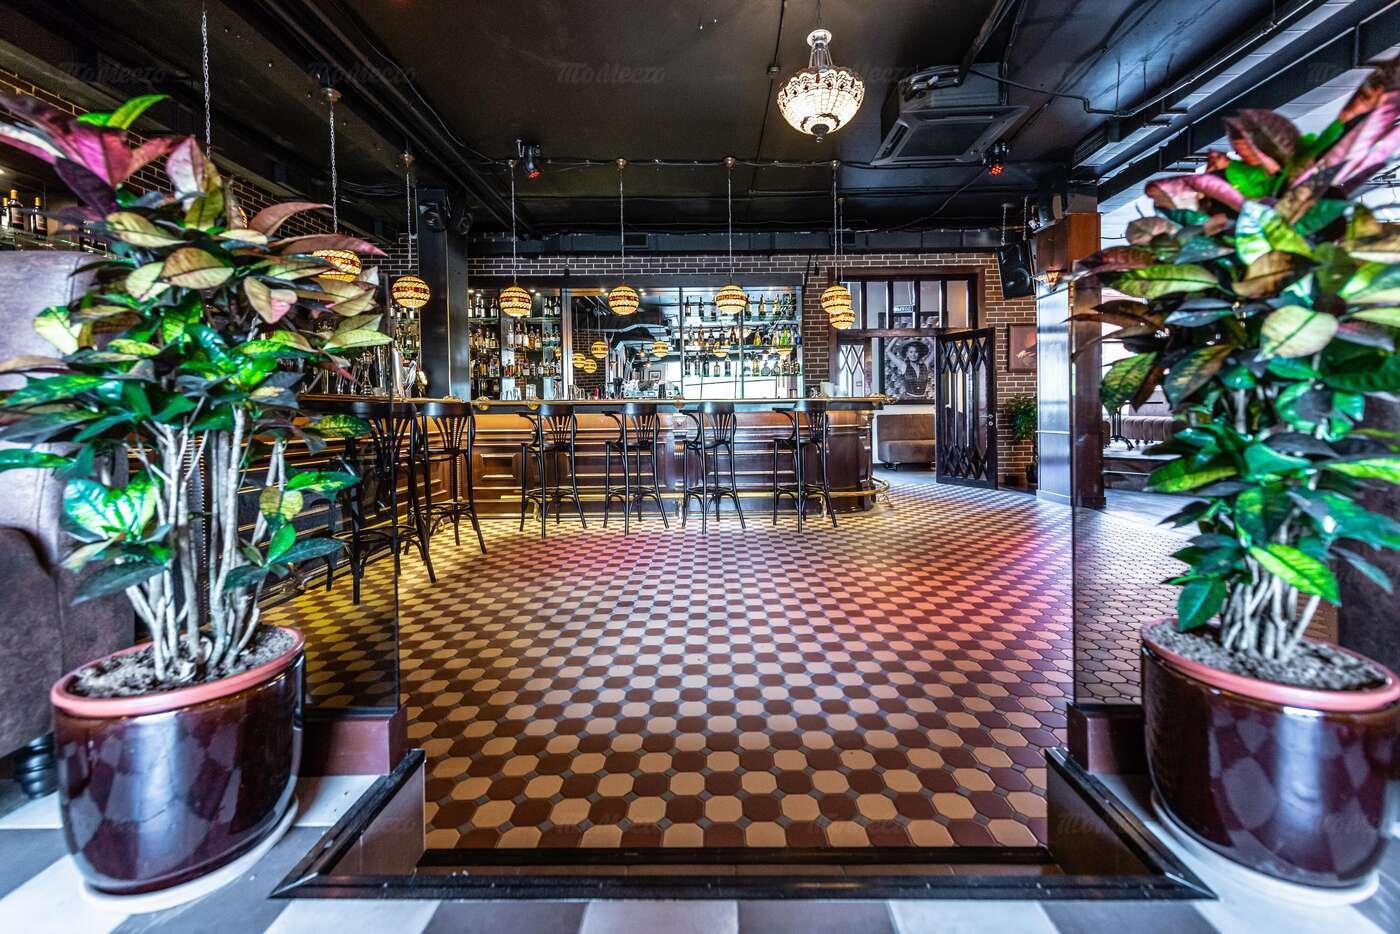 Ресторан Темпл Бар (Temple Bar) в Нижнем Сусальном переулке фото 5